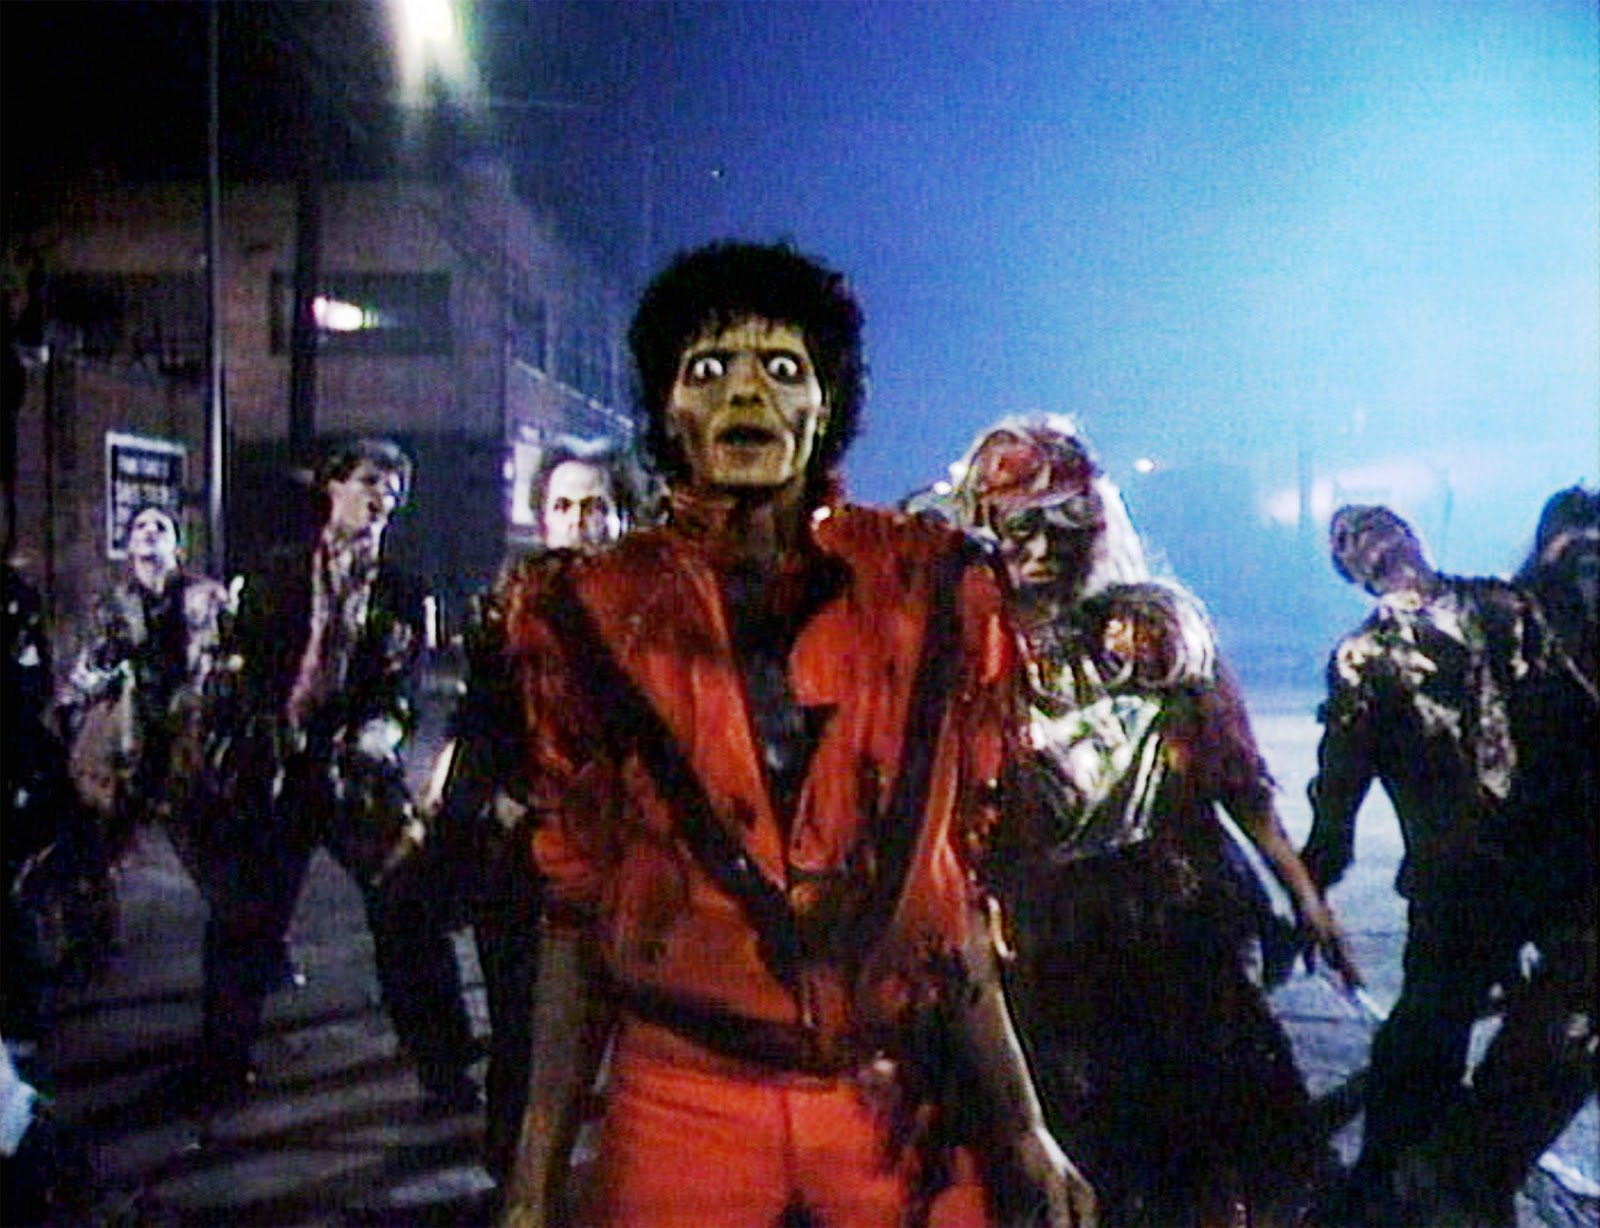 [Jeu] Association d'images - Page 11 KW-35-Michael-Jackson-Thriller